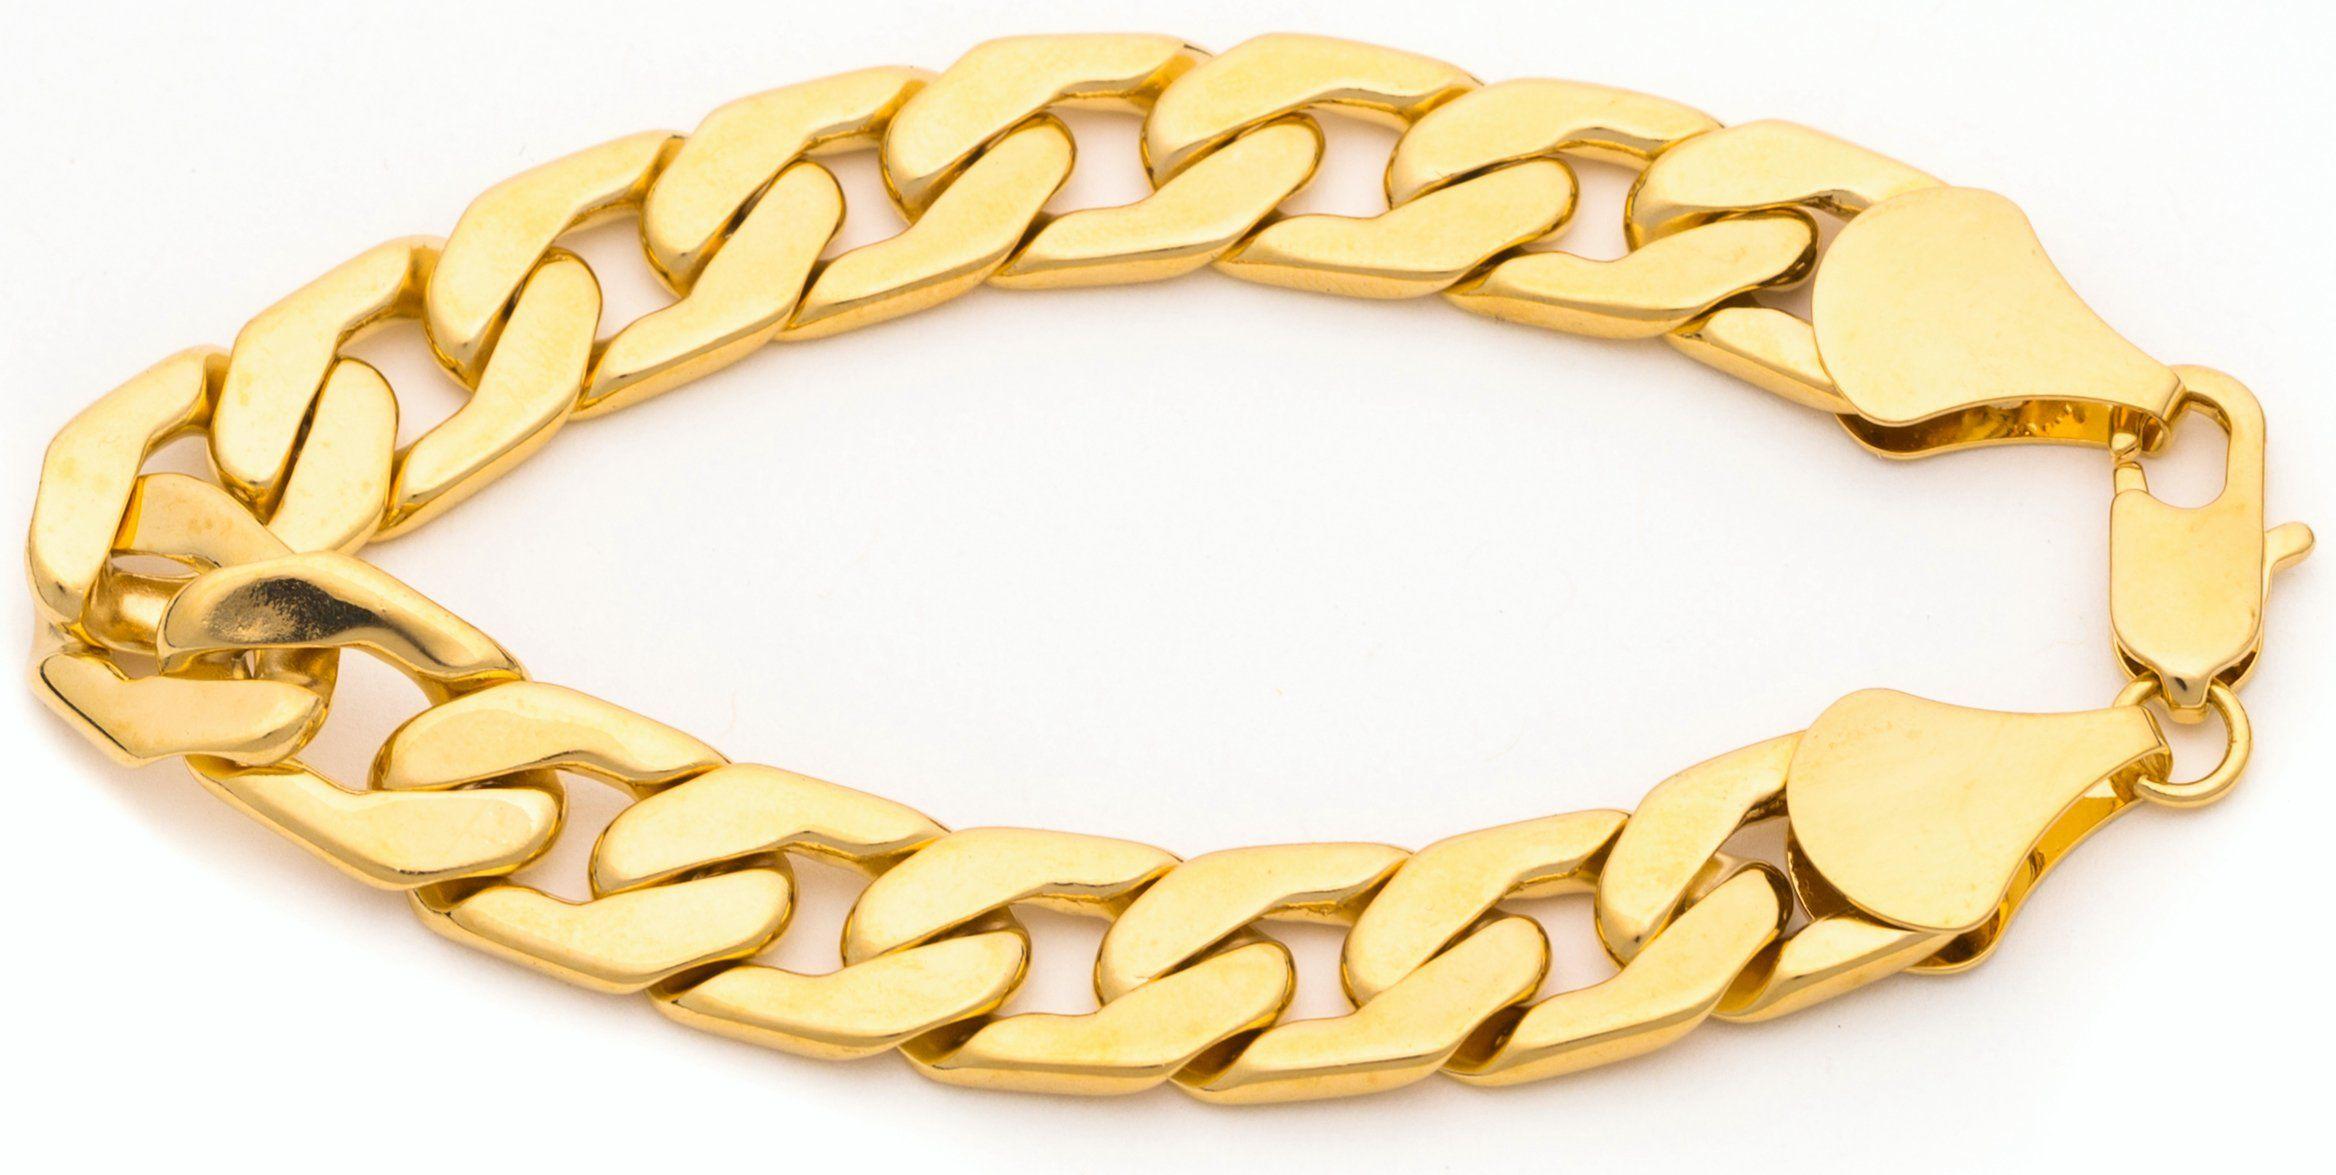 Lifetime jewelry cuban link bracelet mm flat wide k gold over